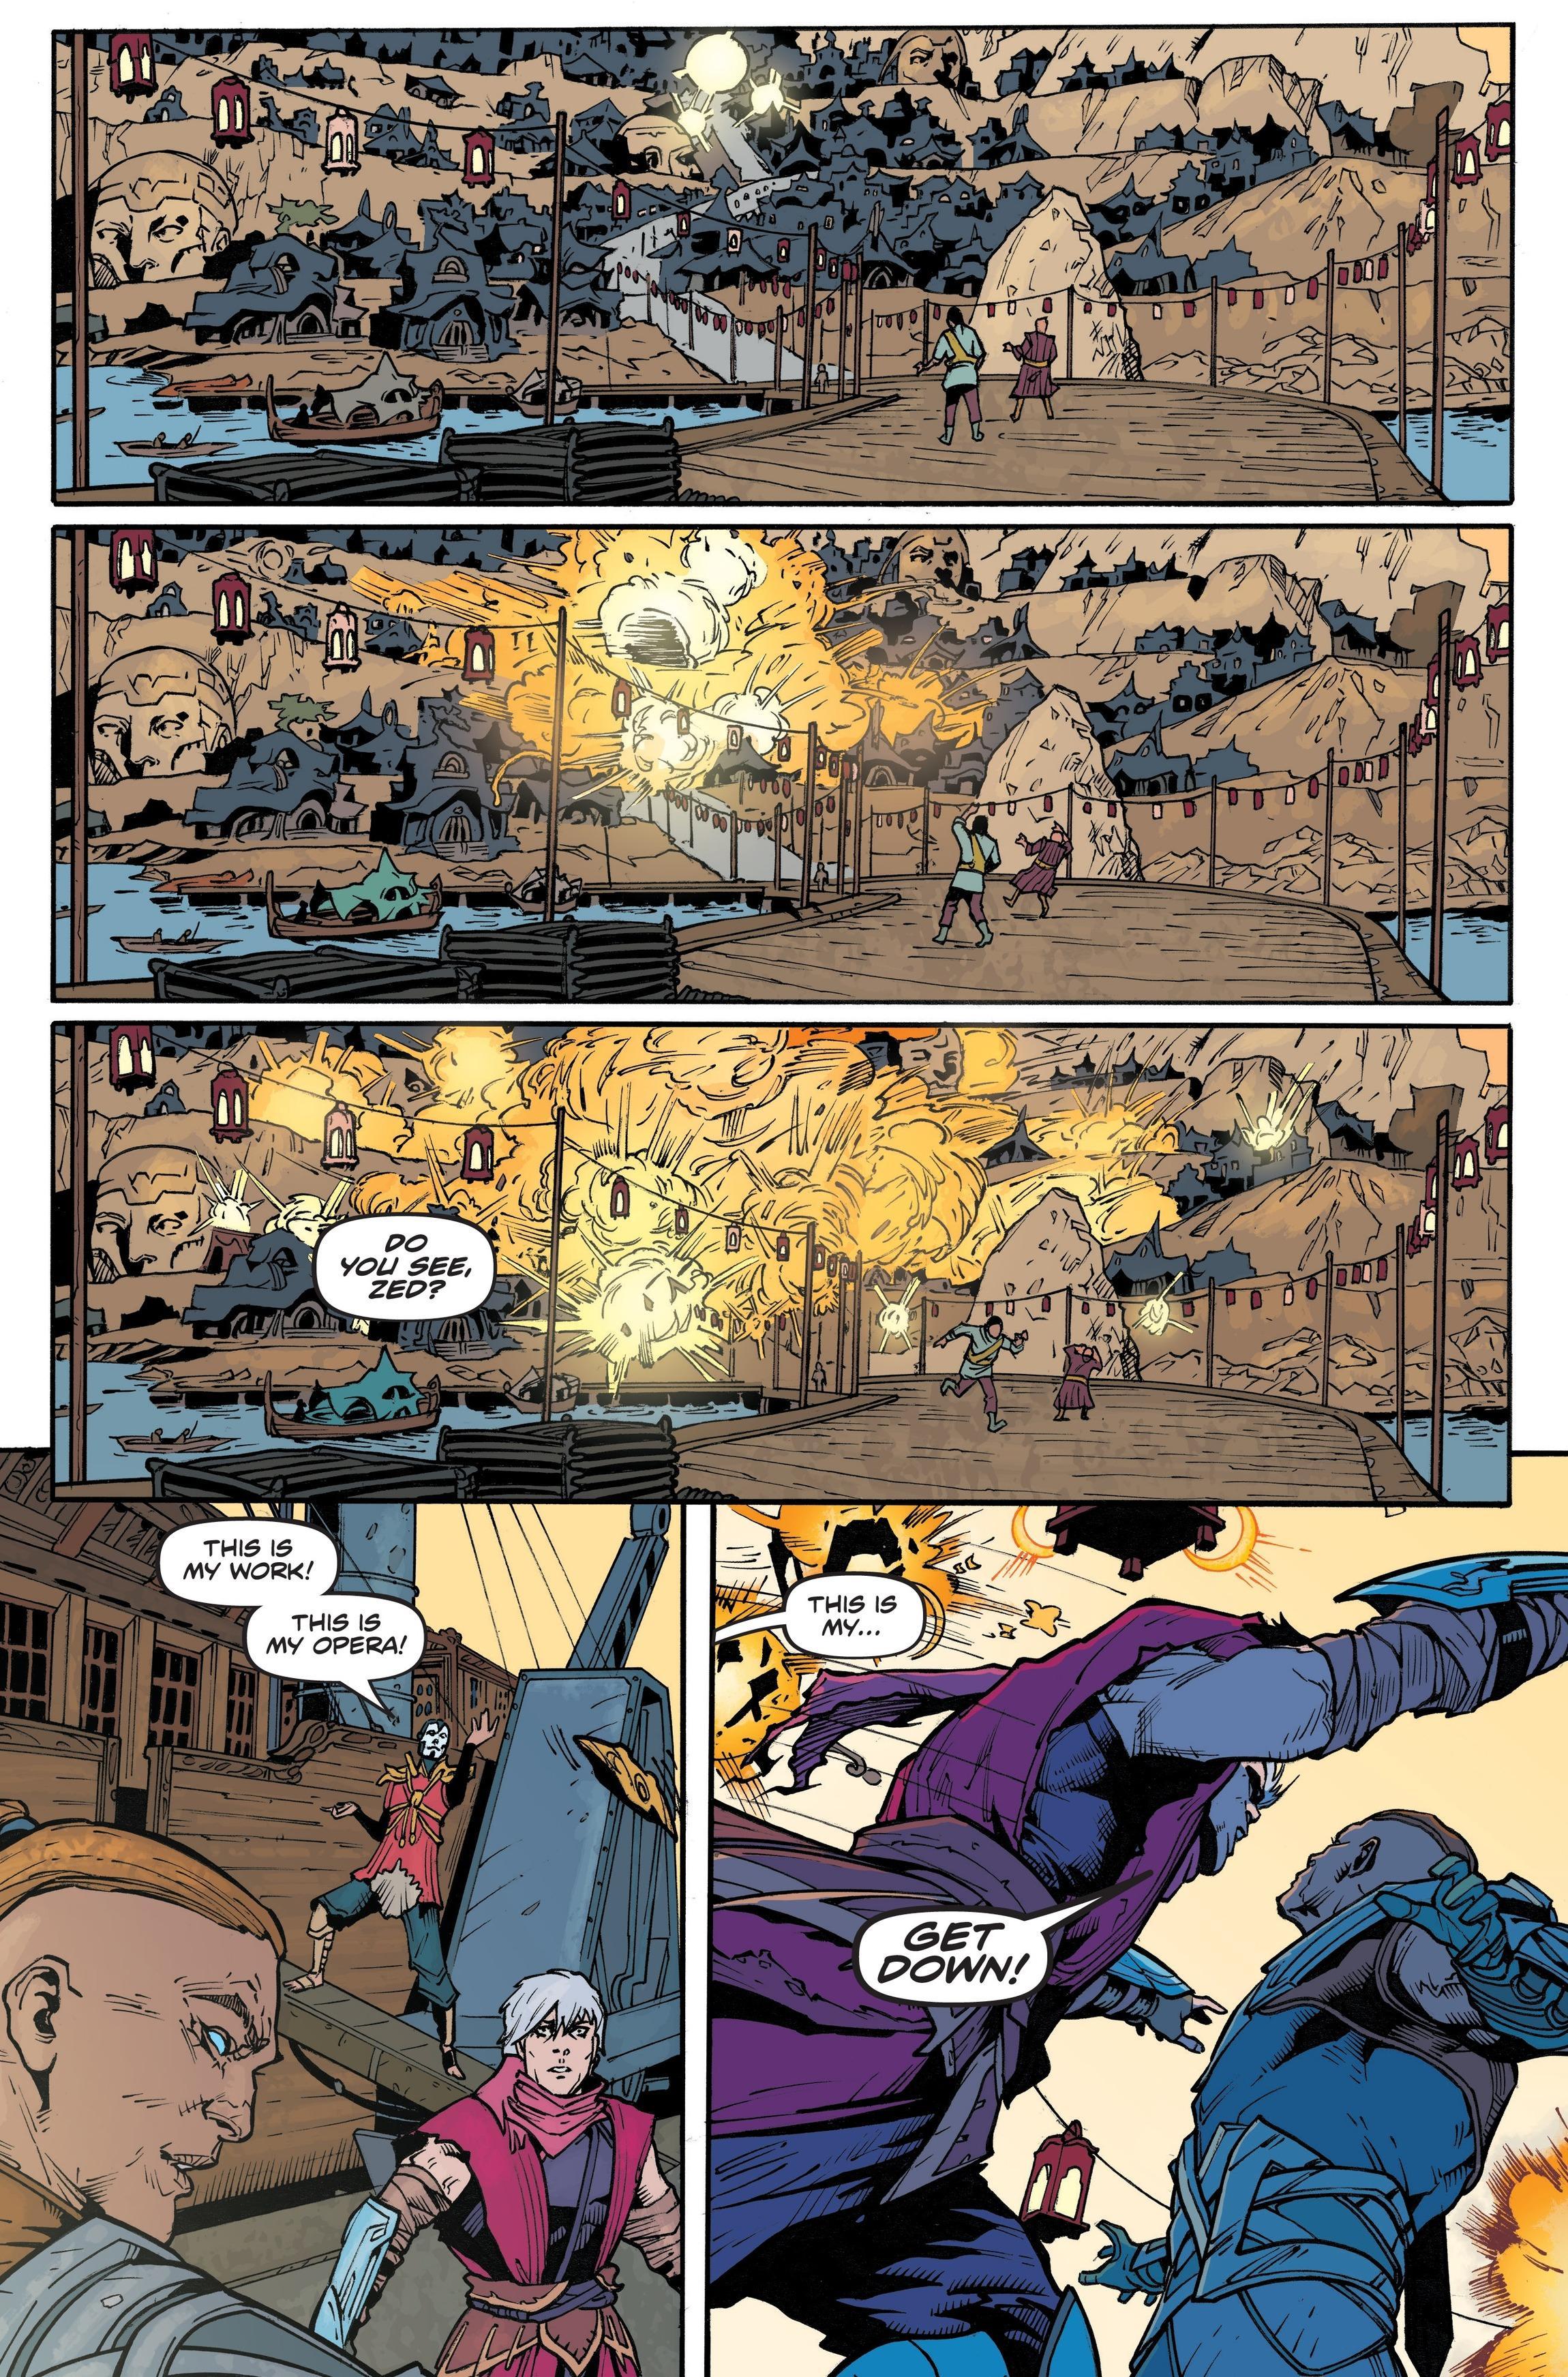 Zed Comic 4 pr07